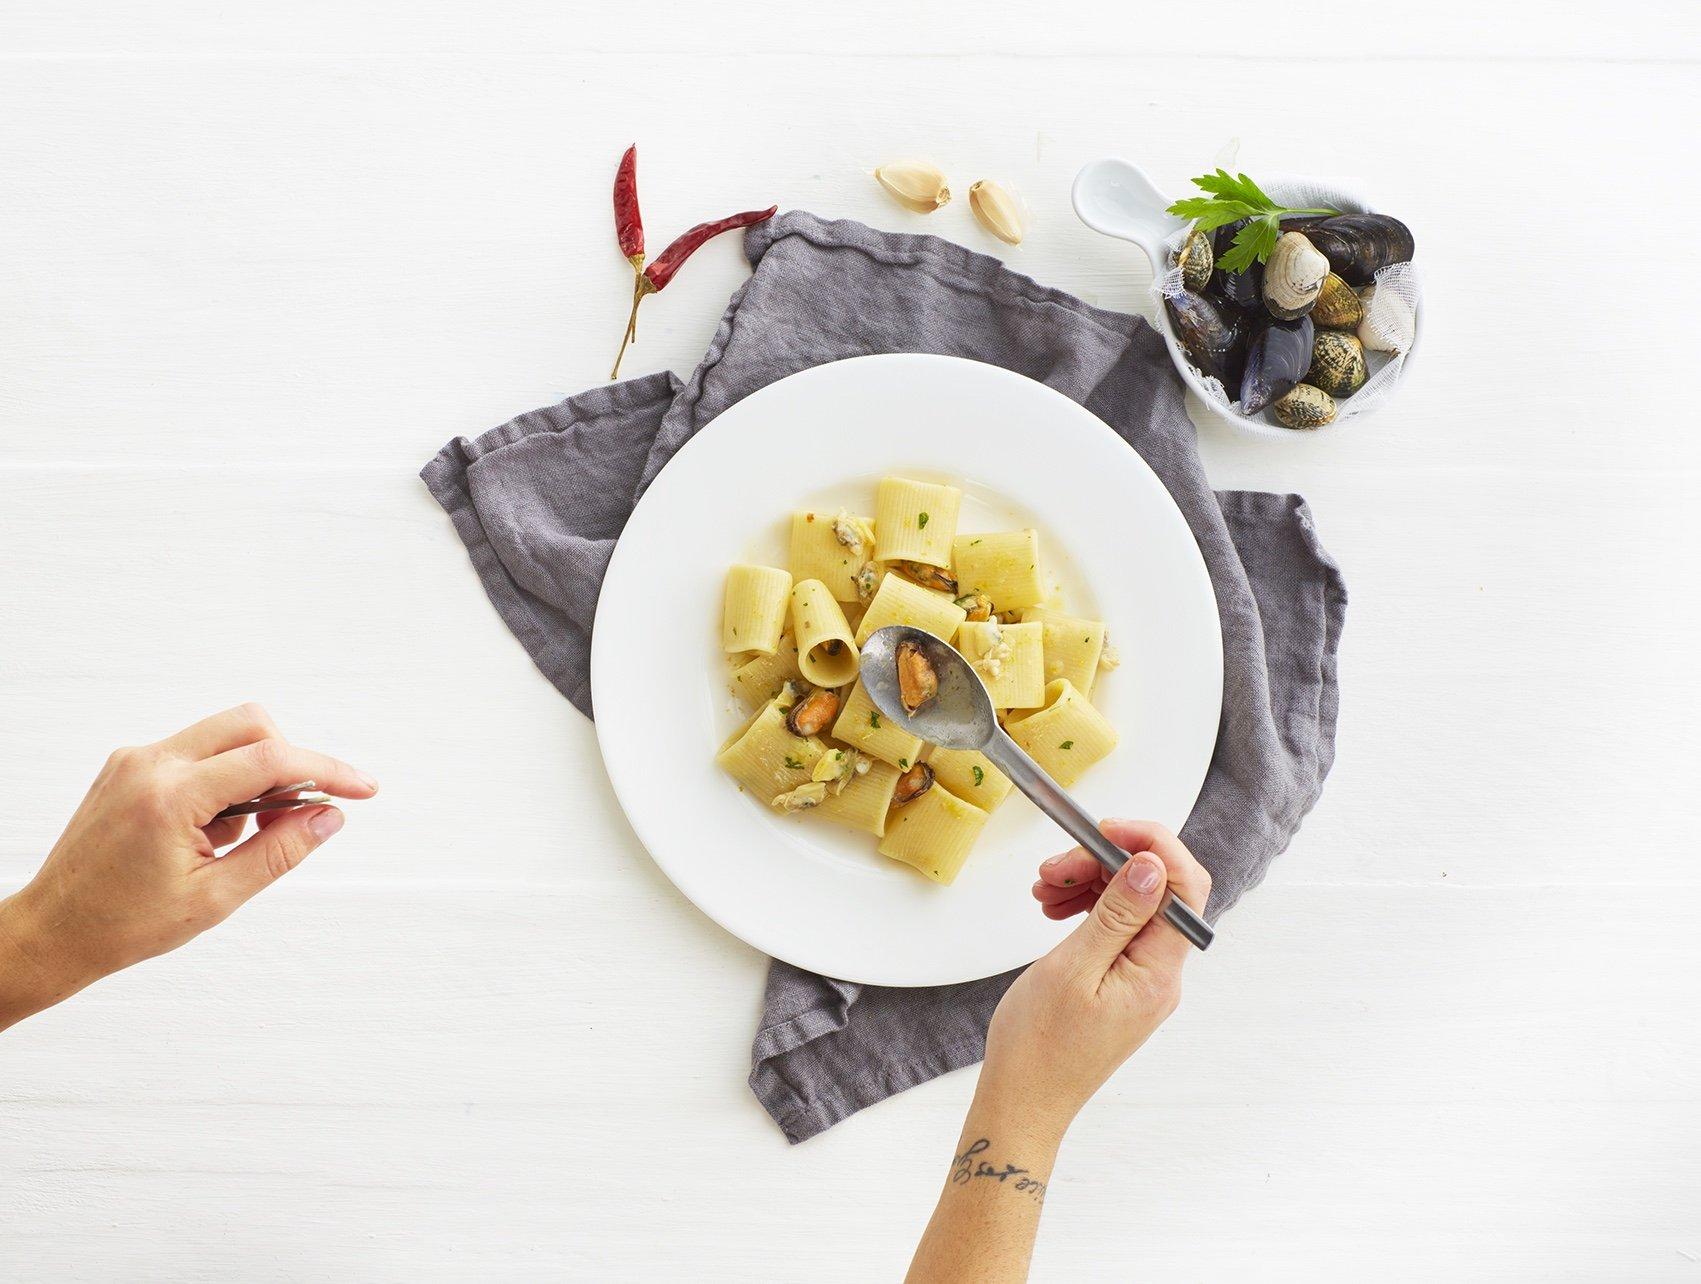 Corso di Food Styling | E 2.0 Food | www.edizioni20food.com